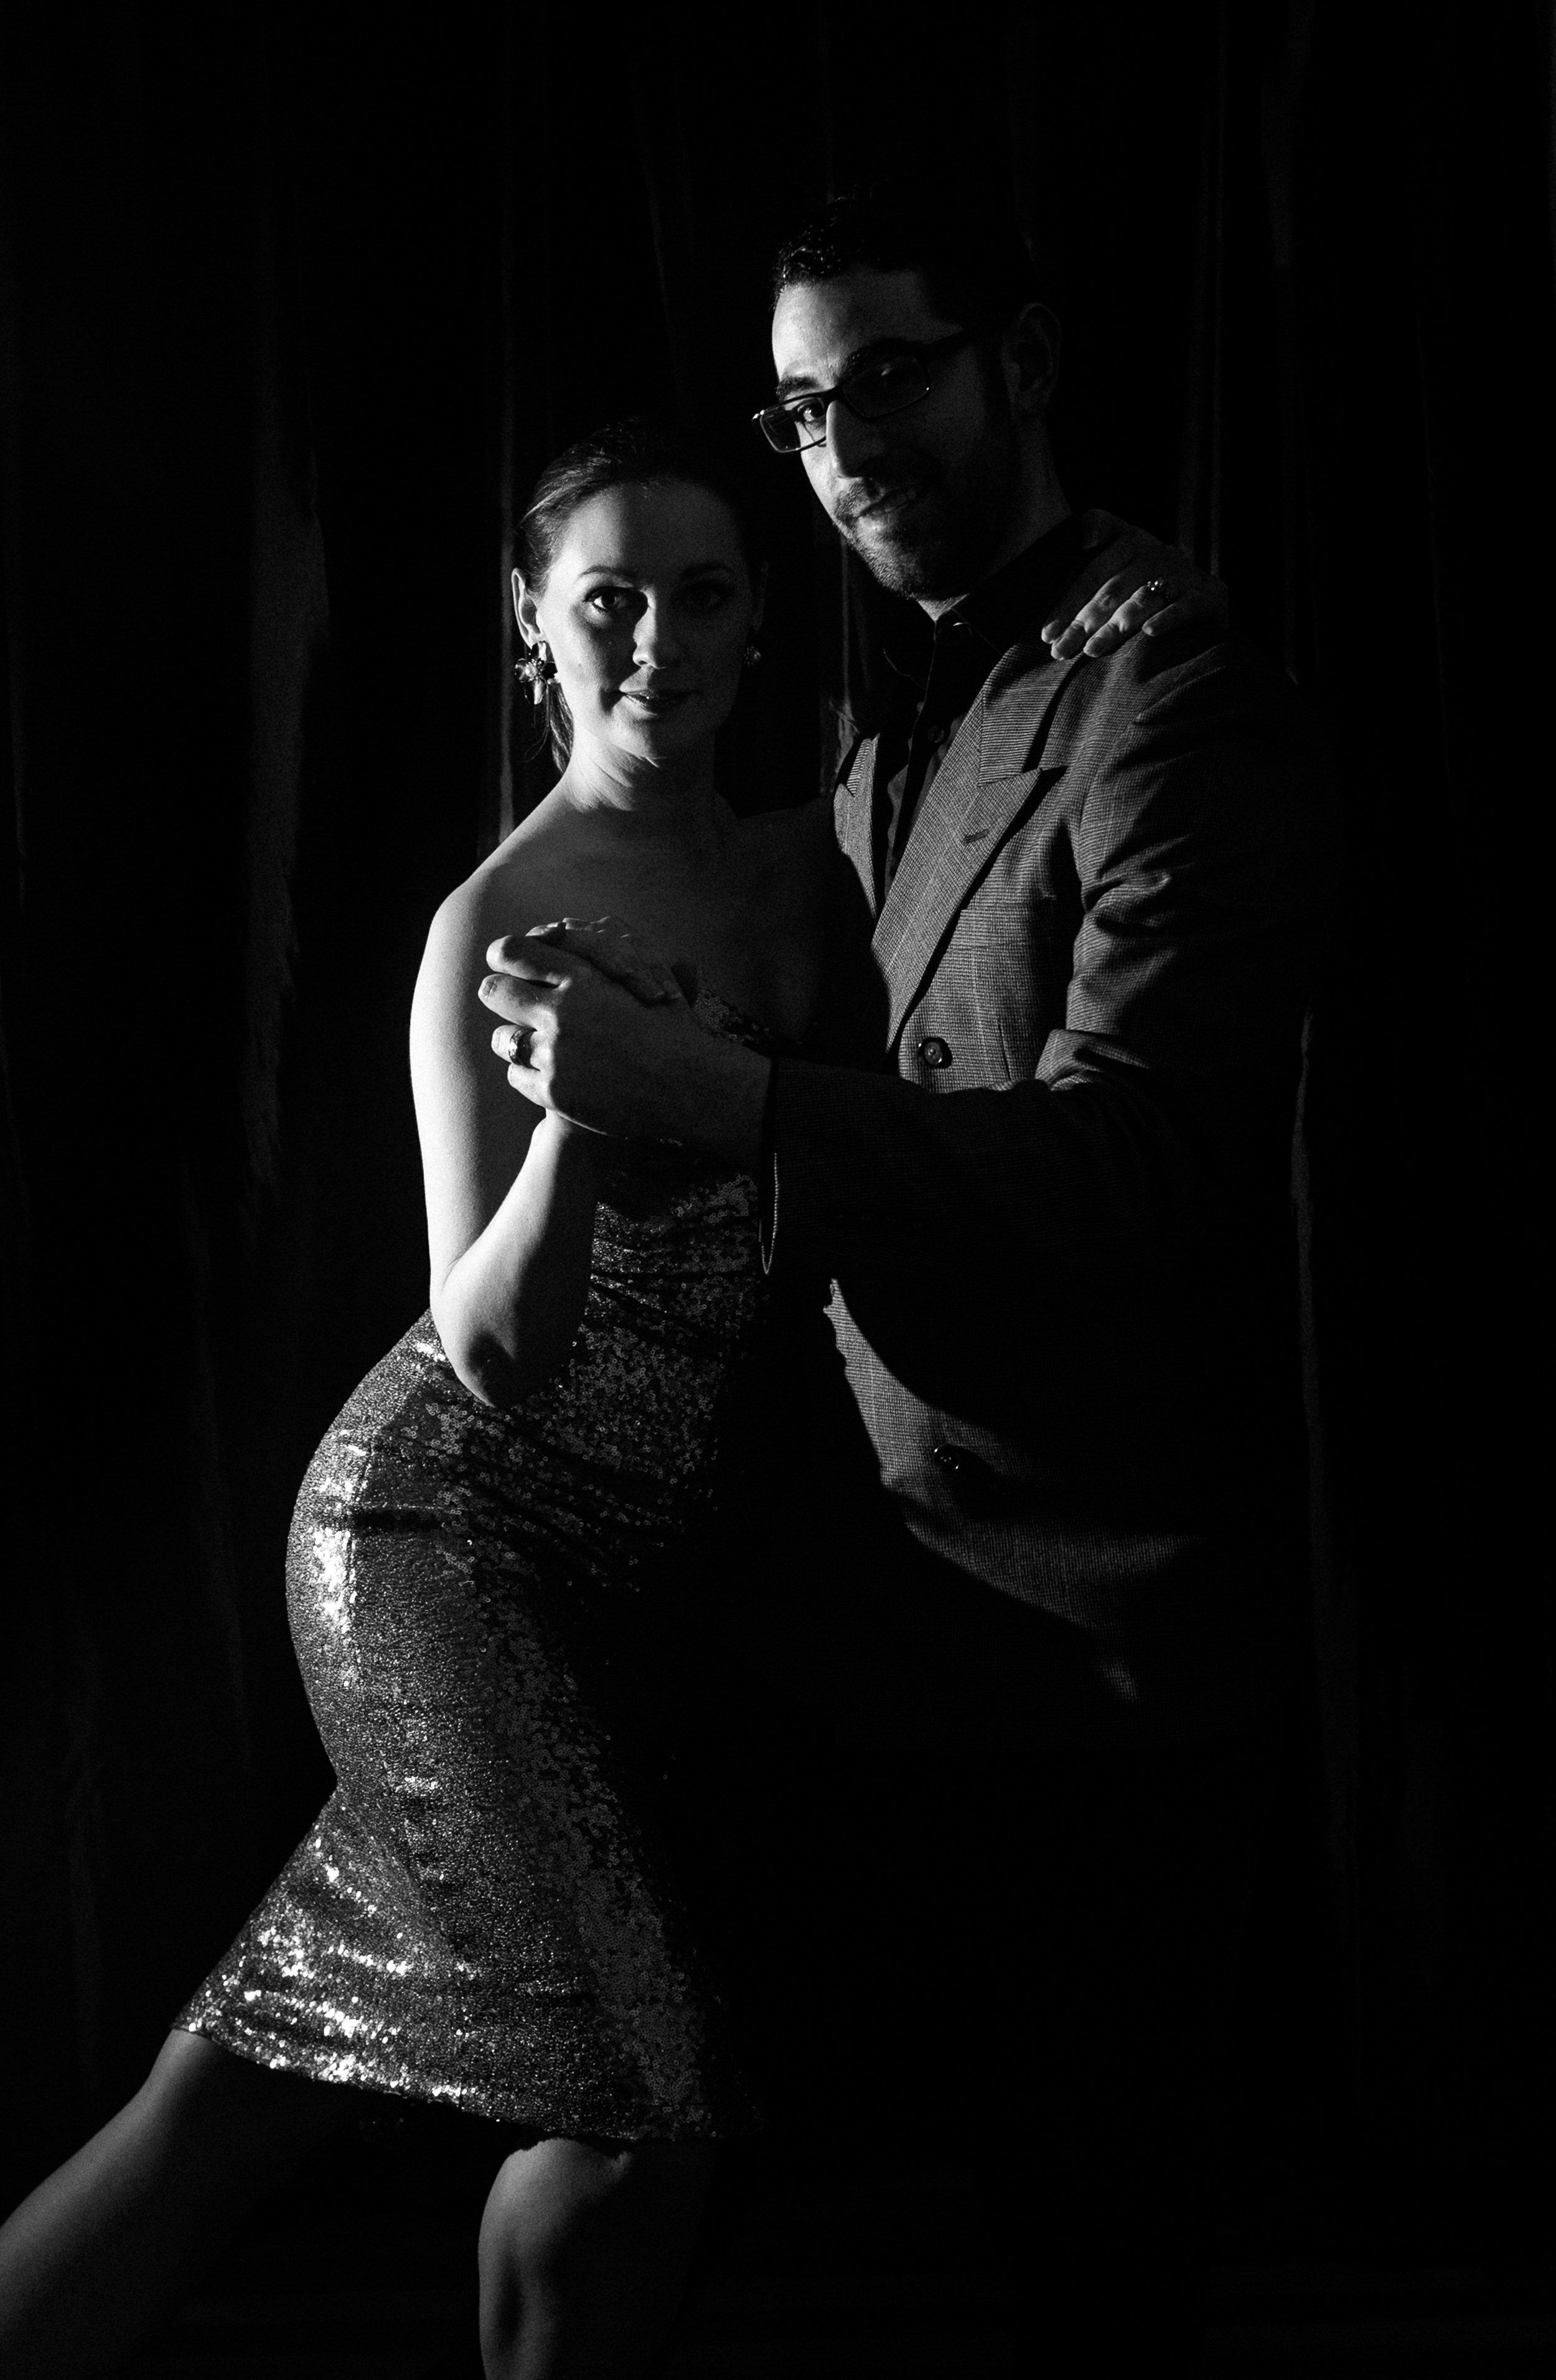 dramatic-dance-portrait-black-white.jpg